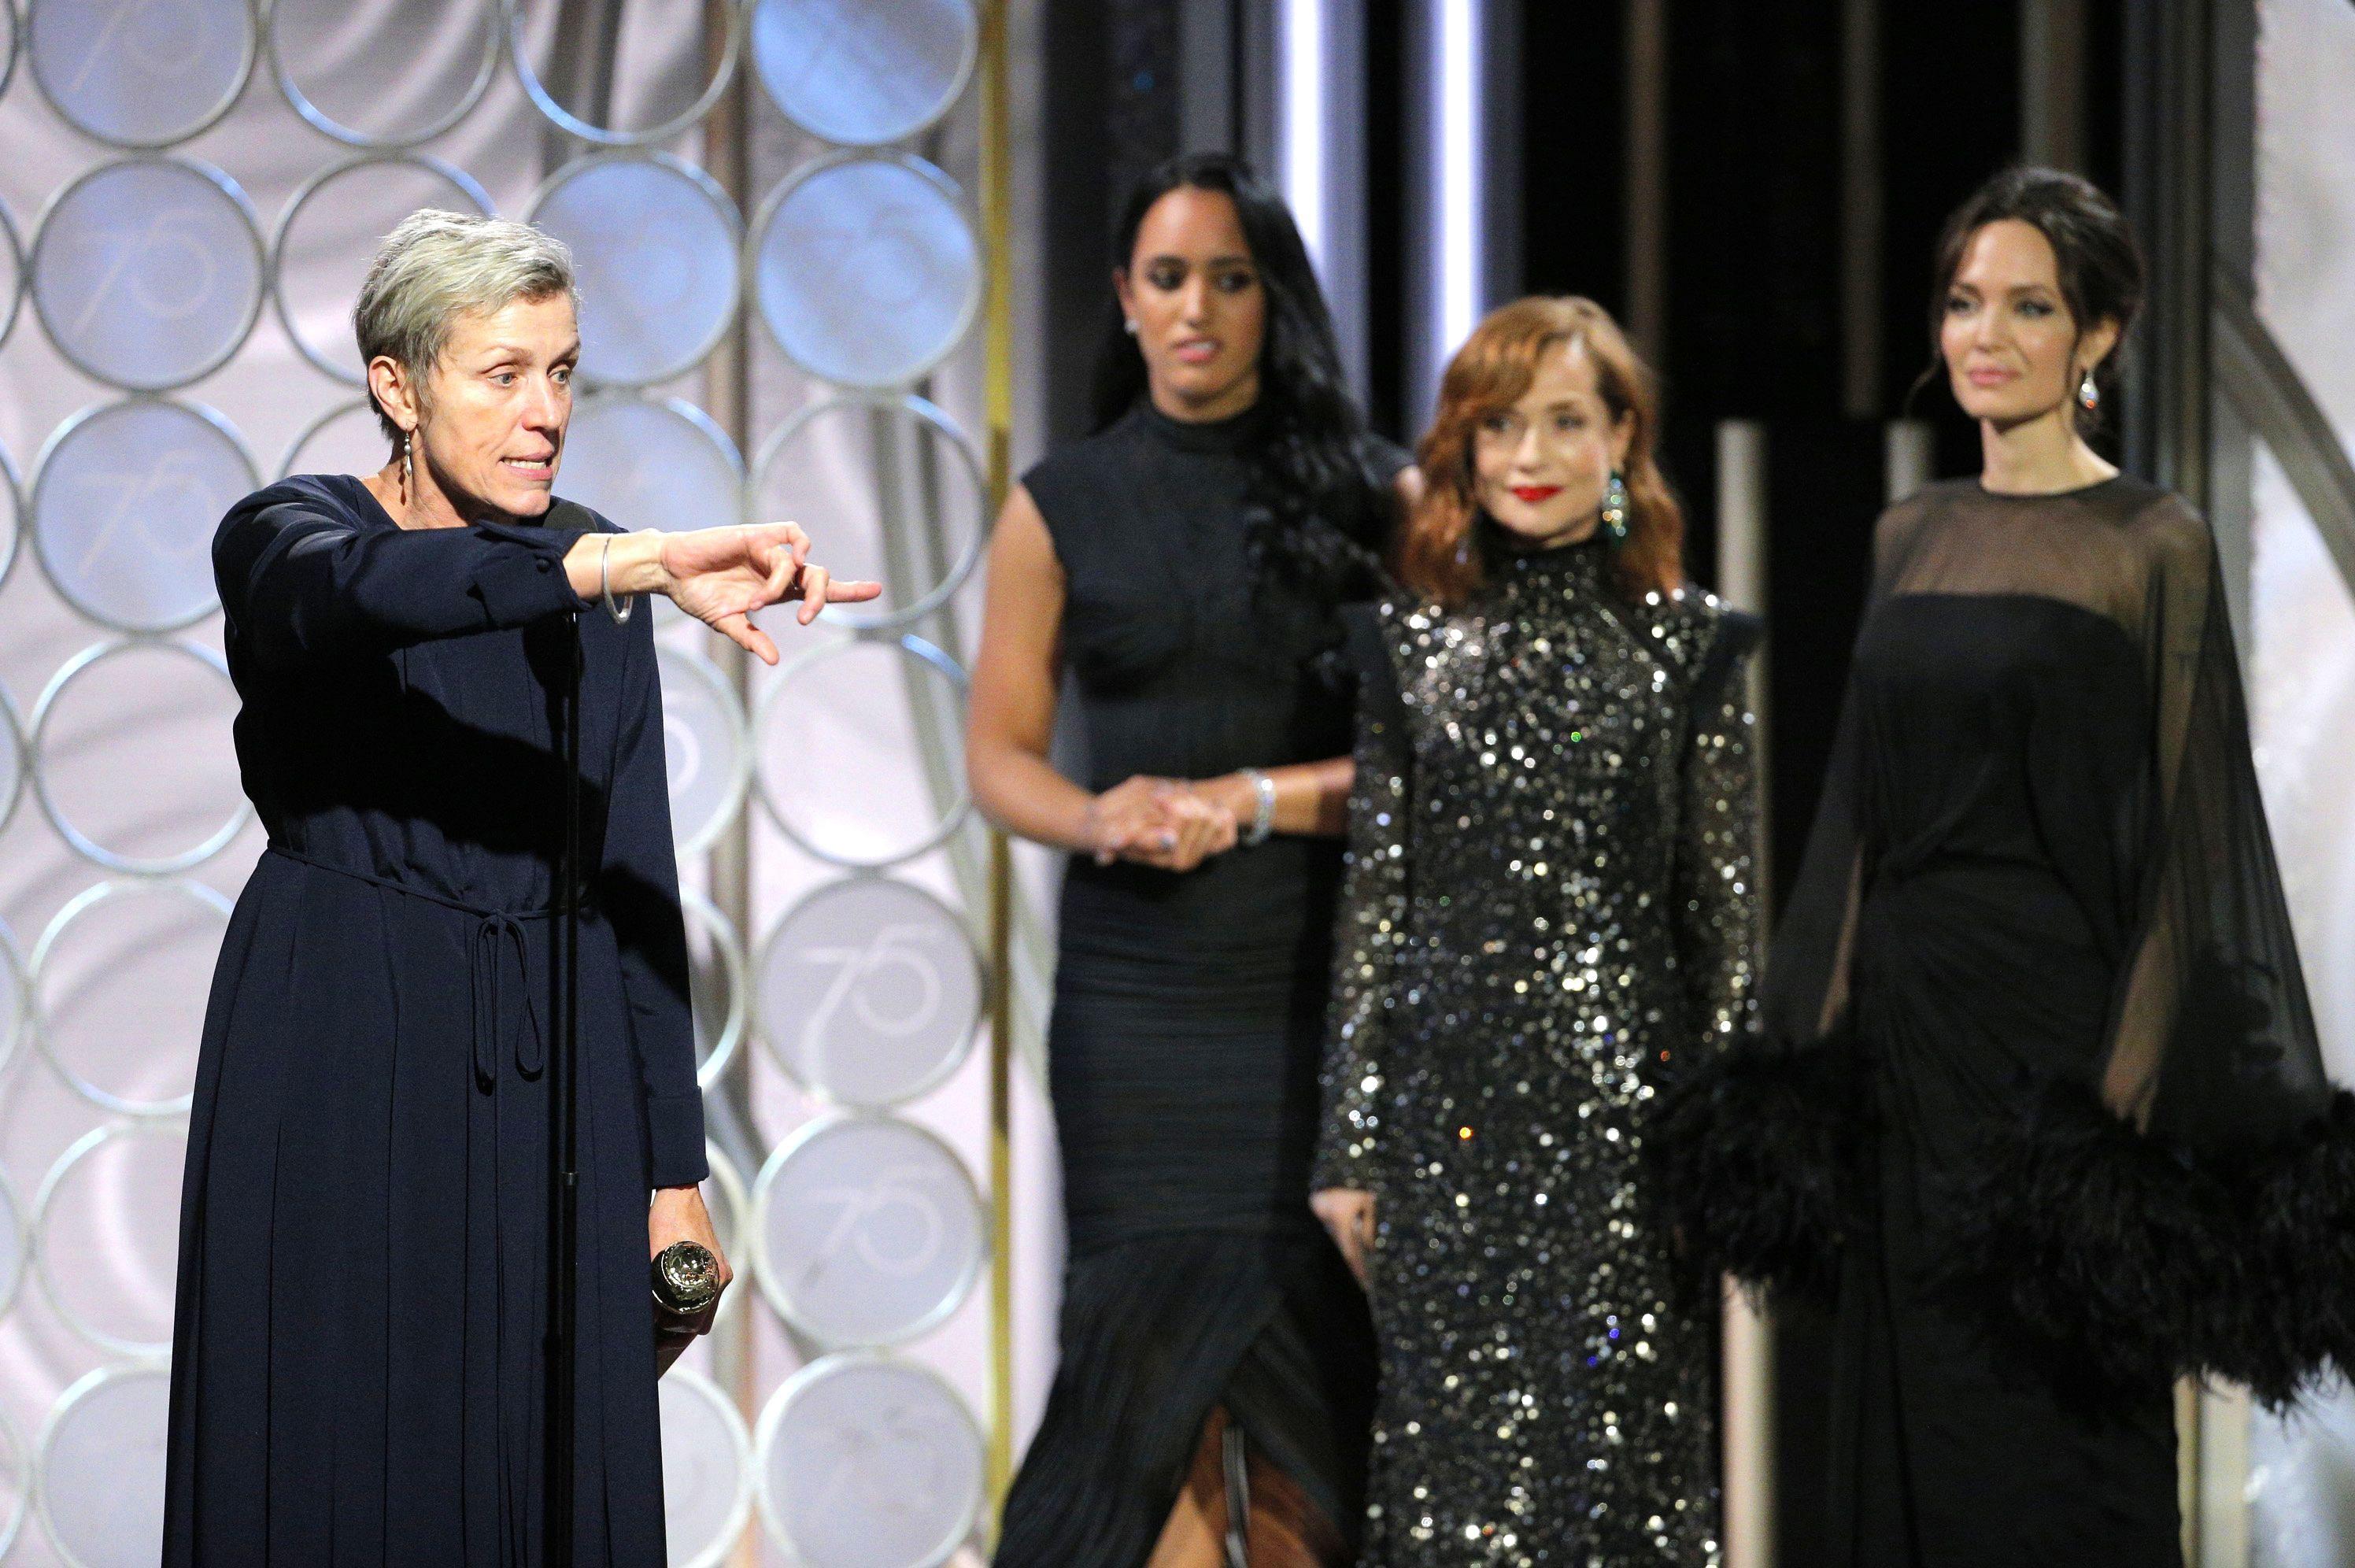 75th Annual Golden Globe Awards, Show, Los Angeles, USA - 07 Jan 2018